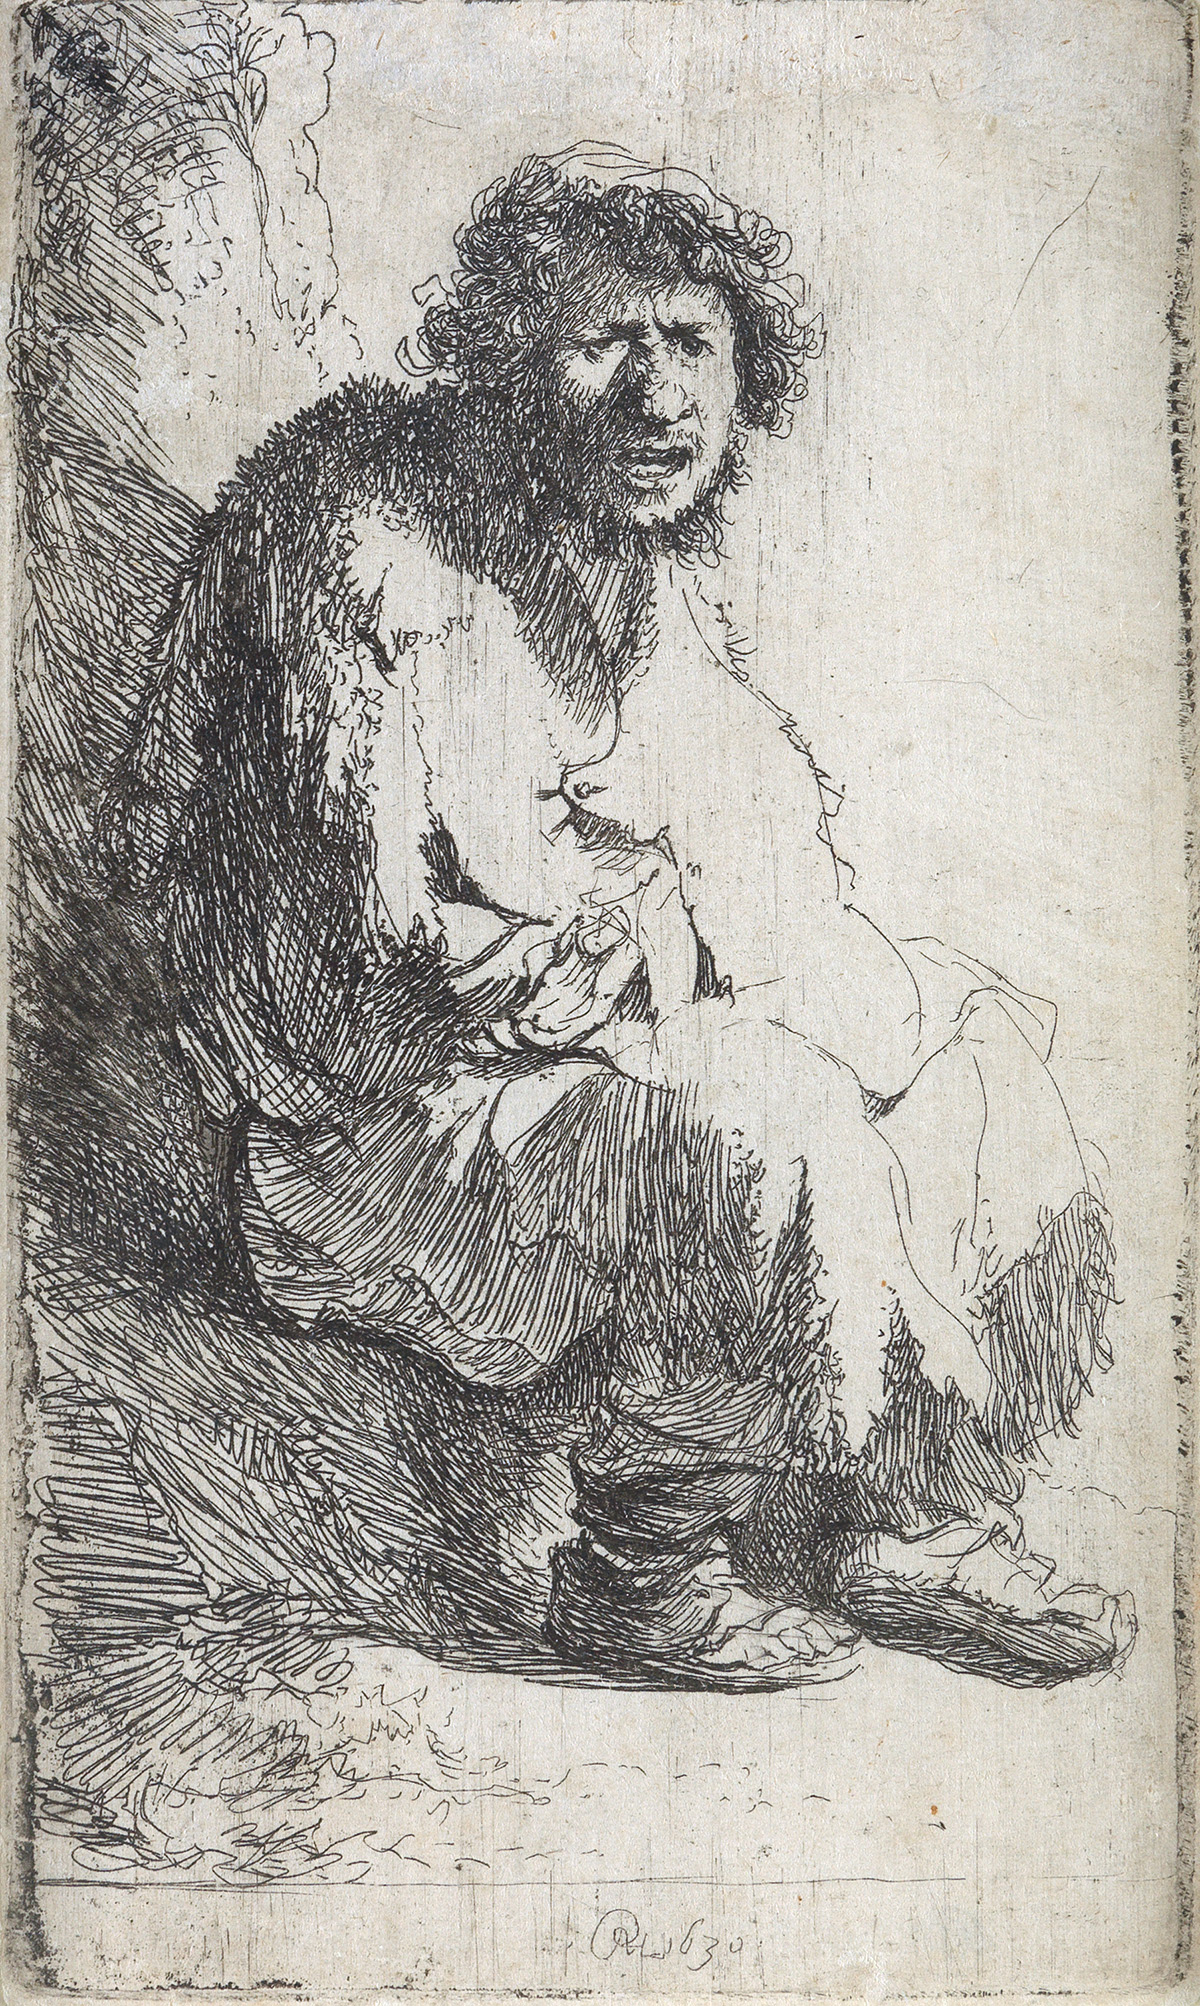 REMBRANDT VAN RIJN A Beggar Seated on a Bank.